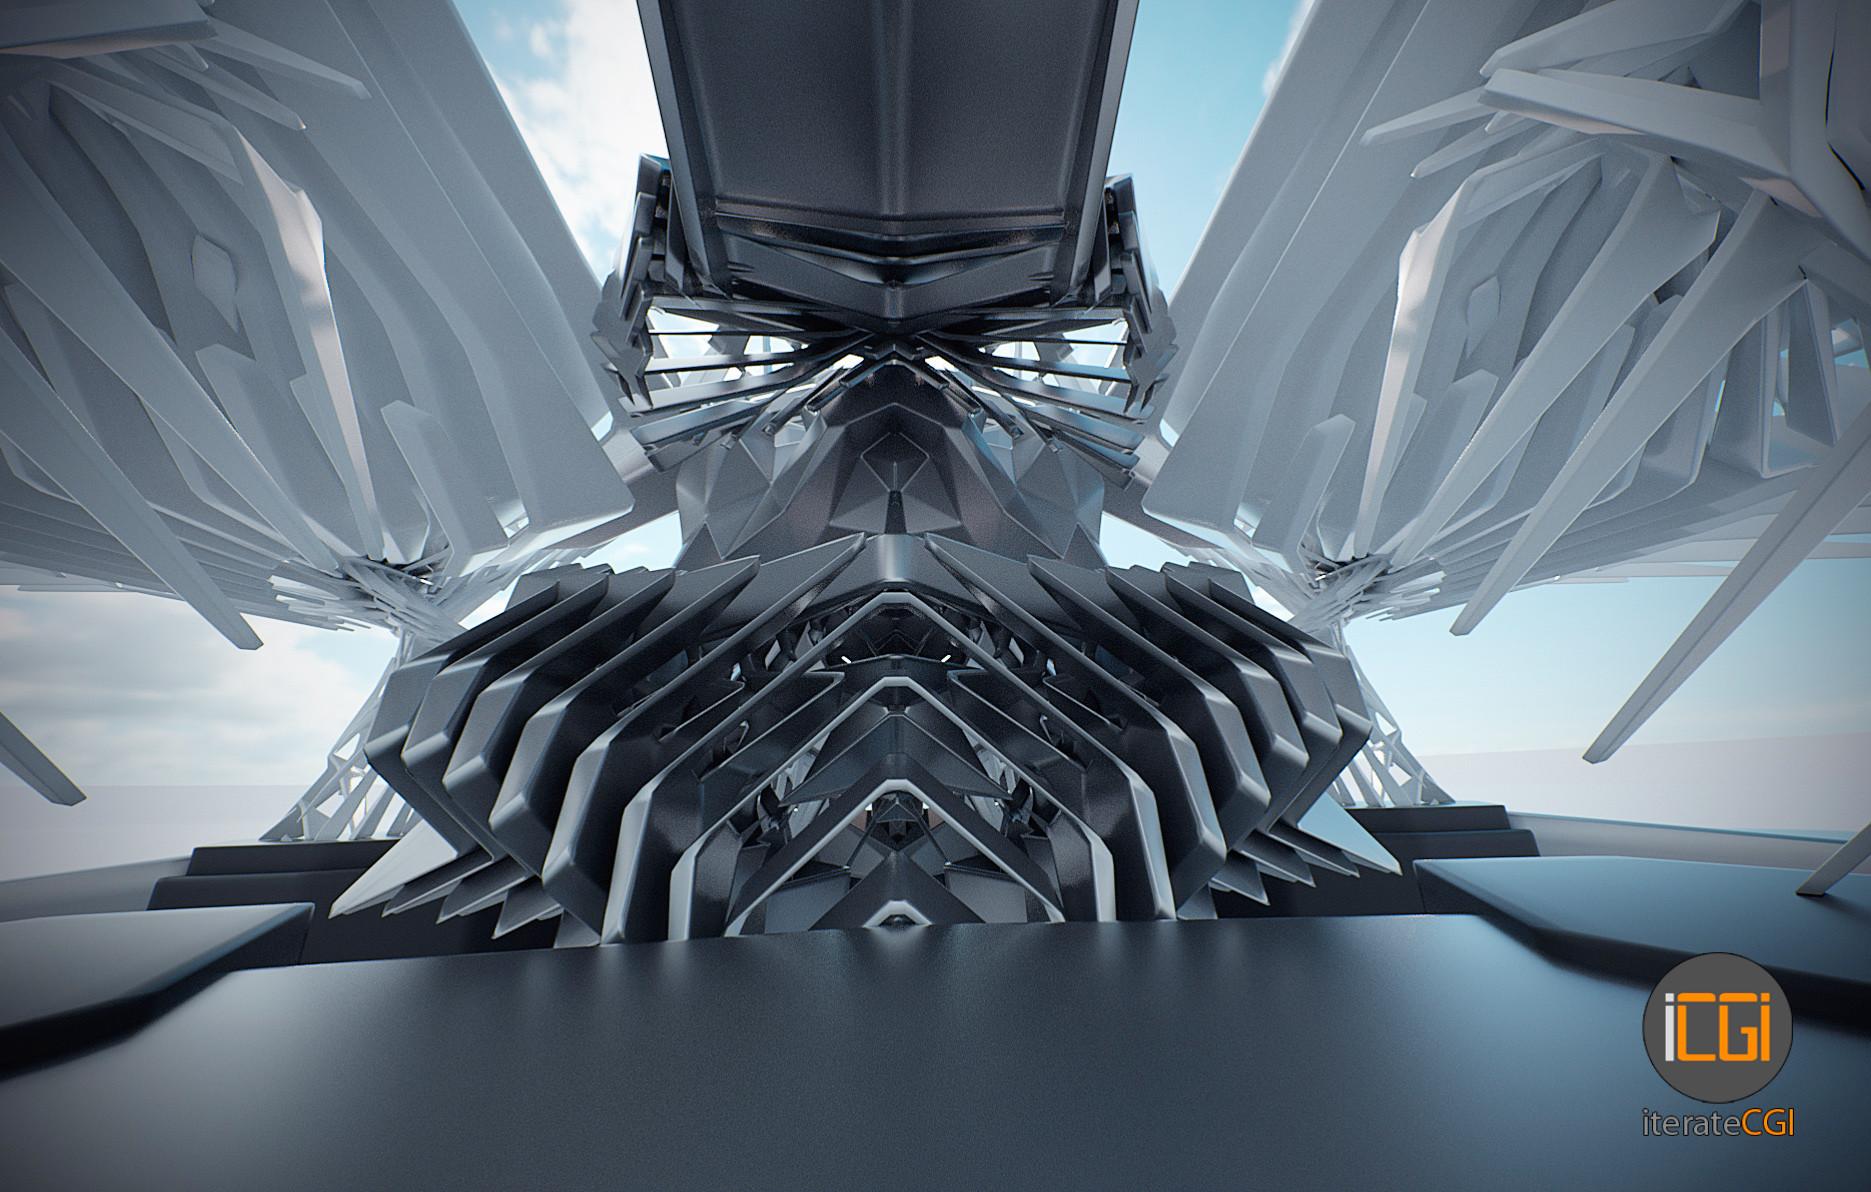 Johan de leenheer generative 3d symmetries 7